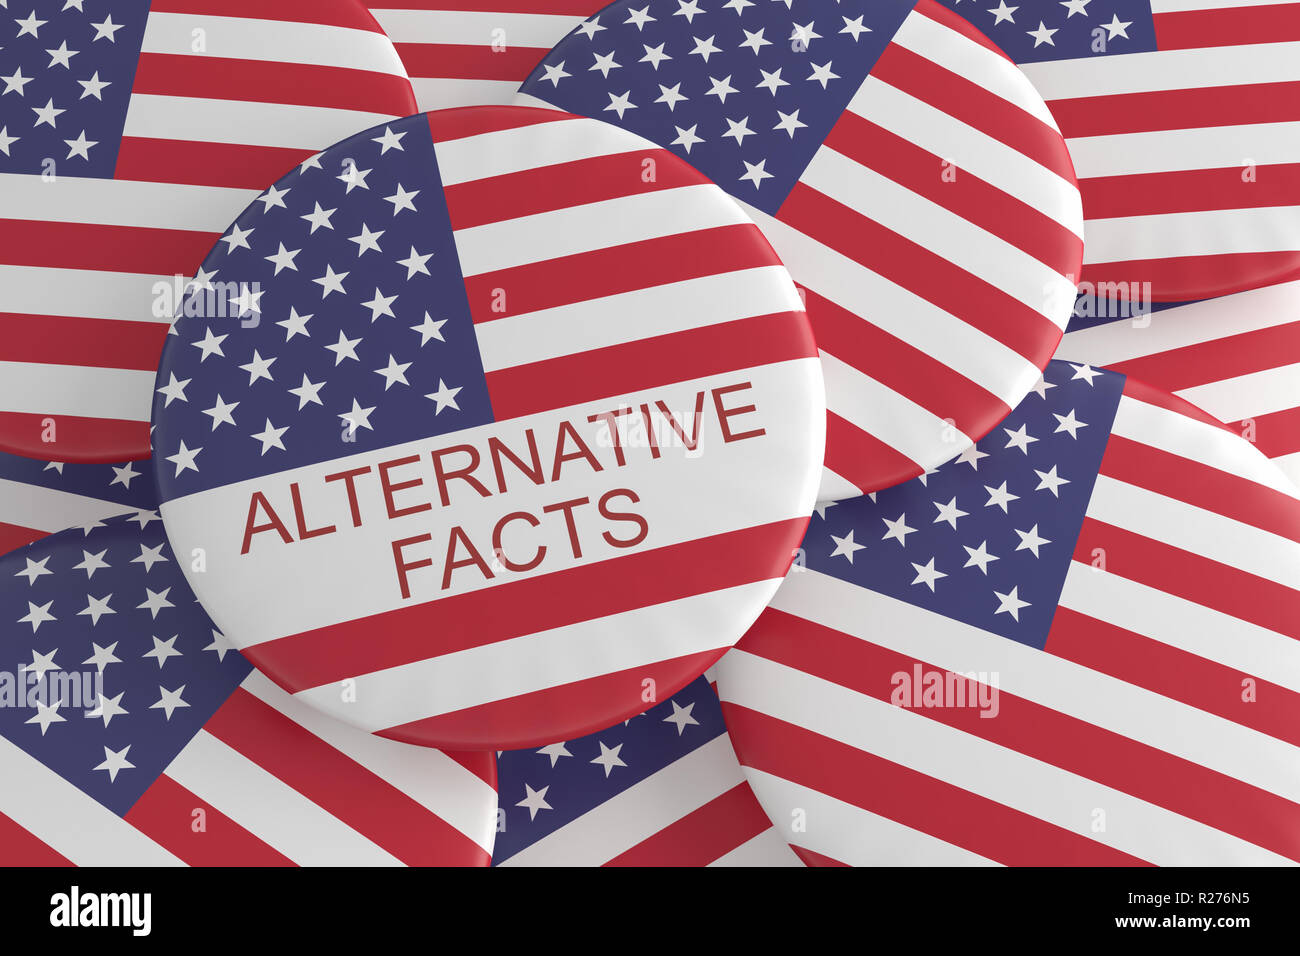 USA Medien Aktuelles Konzept Abzeichen: Mit alternativen Fakten Button mit US-Flagge, 3D-Illustration Stapel Stockbild